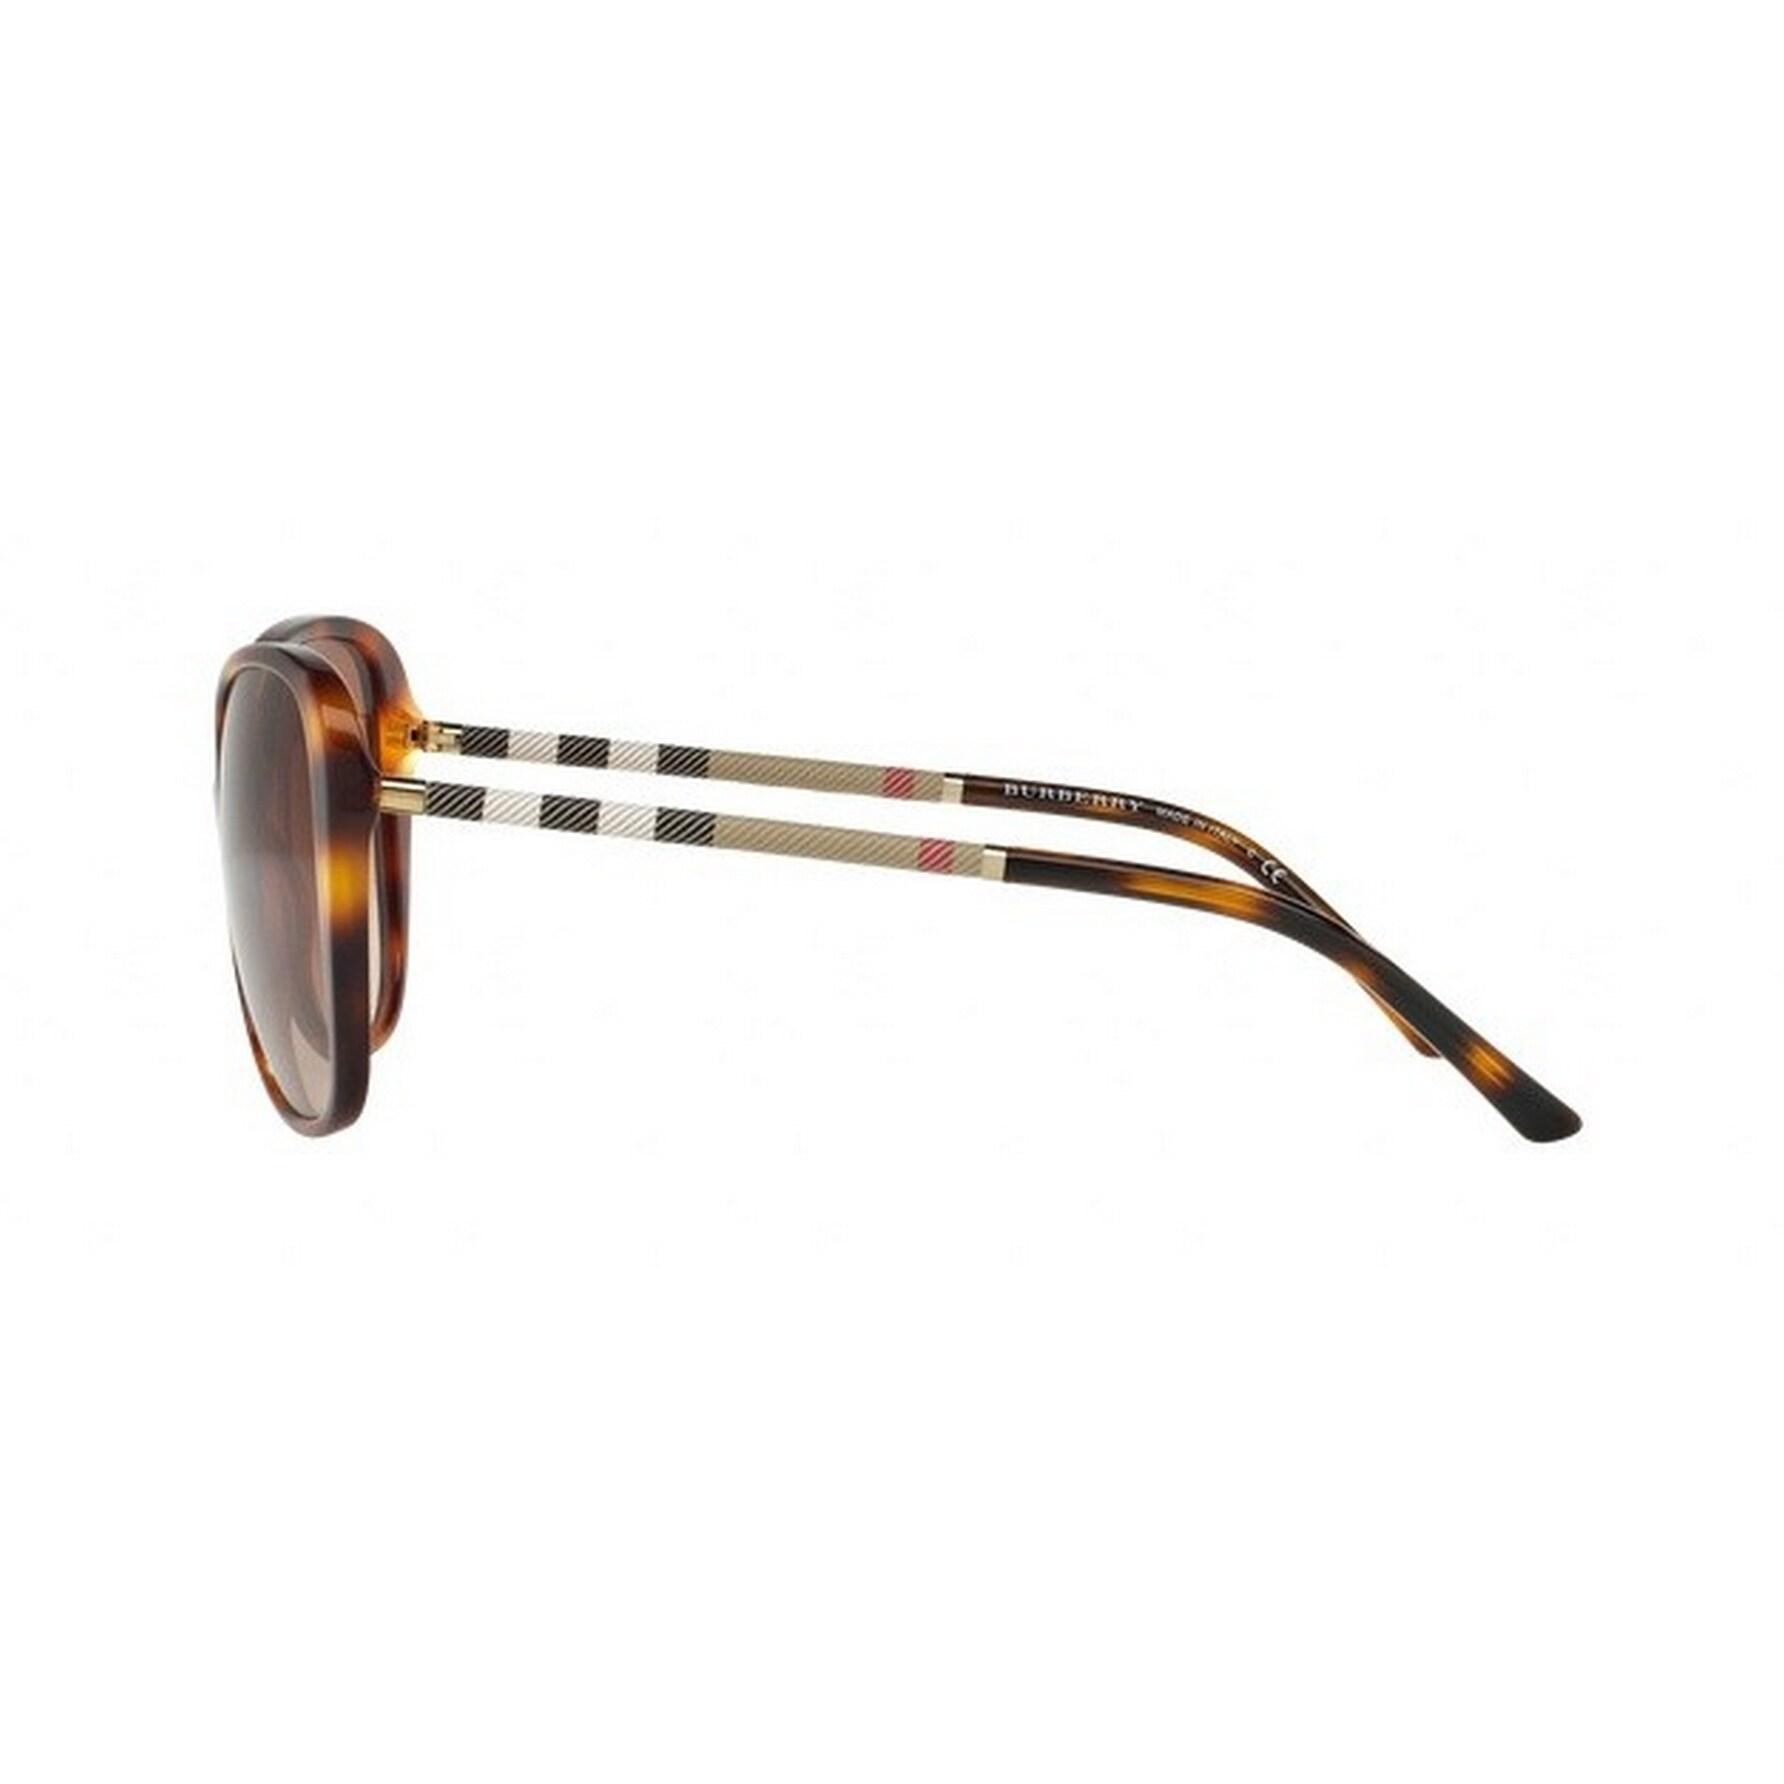 0cd40b3a10b0 Shop Burberry Women s BE4235QF 331613 57 Cateye Plastic Havana Brown  Sunglasses - Free Shipping Today - Overstock.com - 14692556